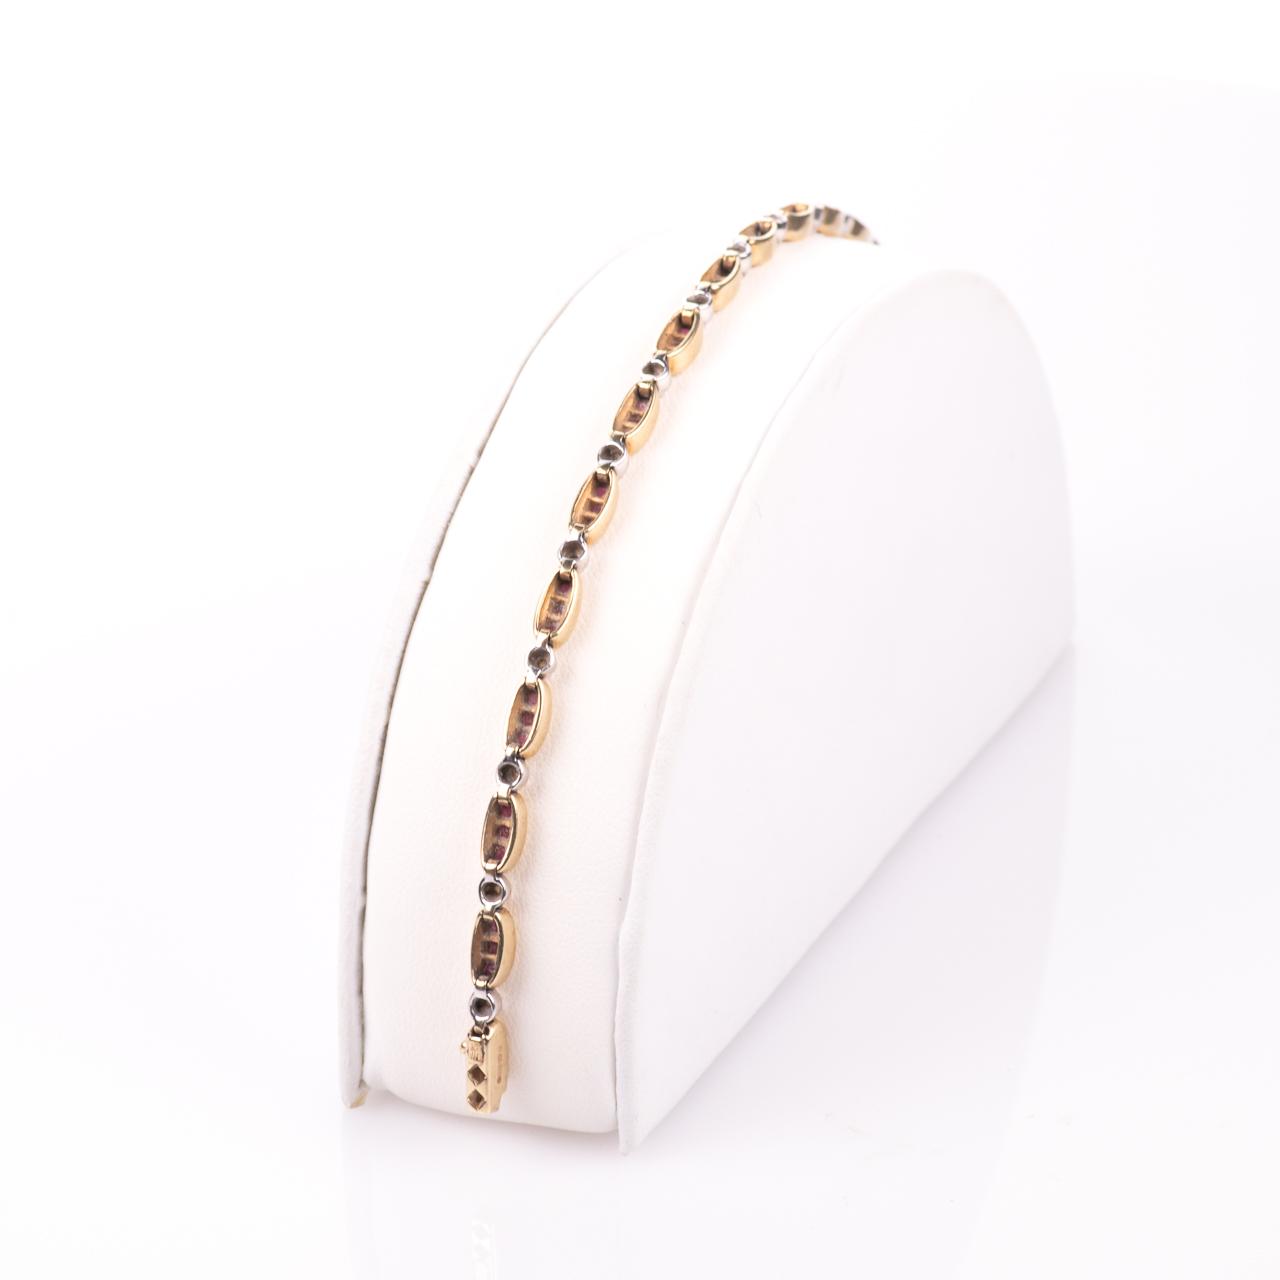 9ct Gold 2ct Ruby & Diamond Tennis Bracelet - Image 5 of 6